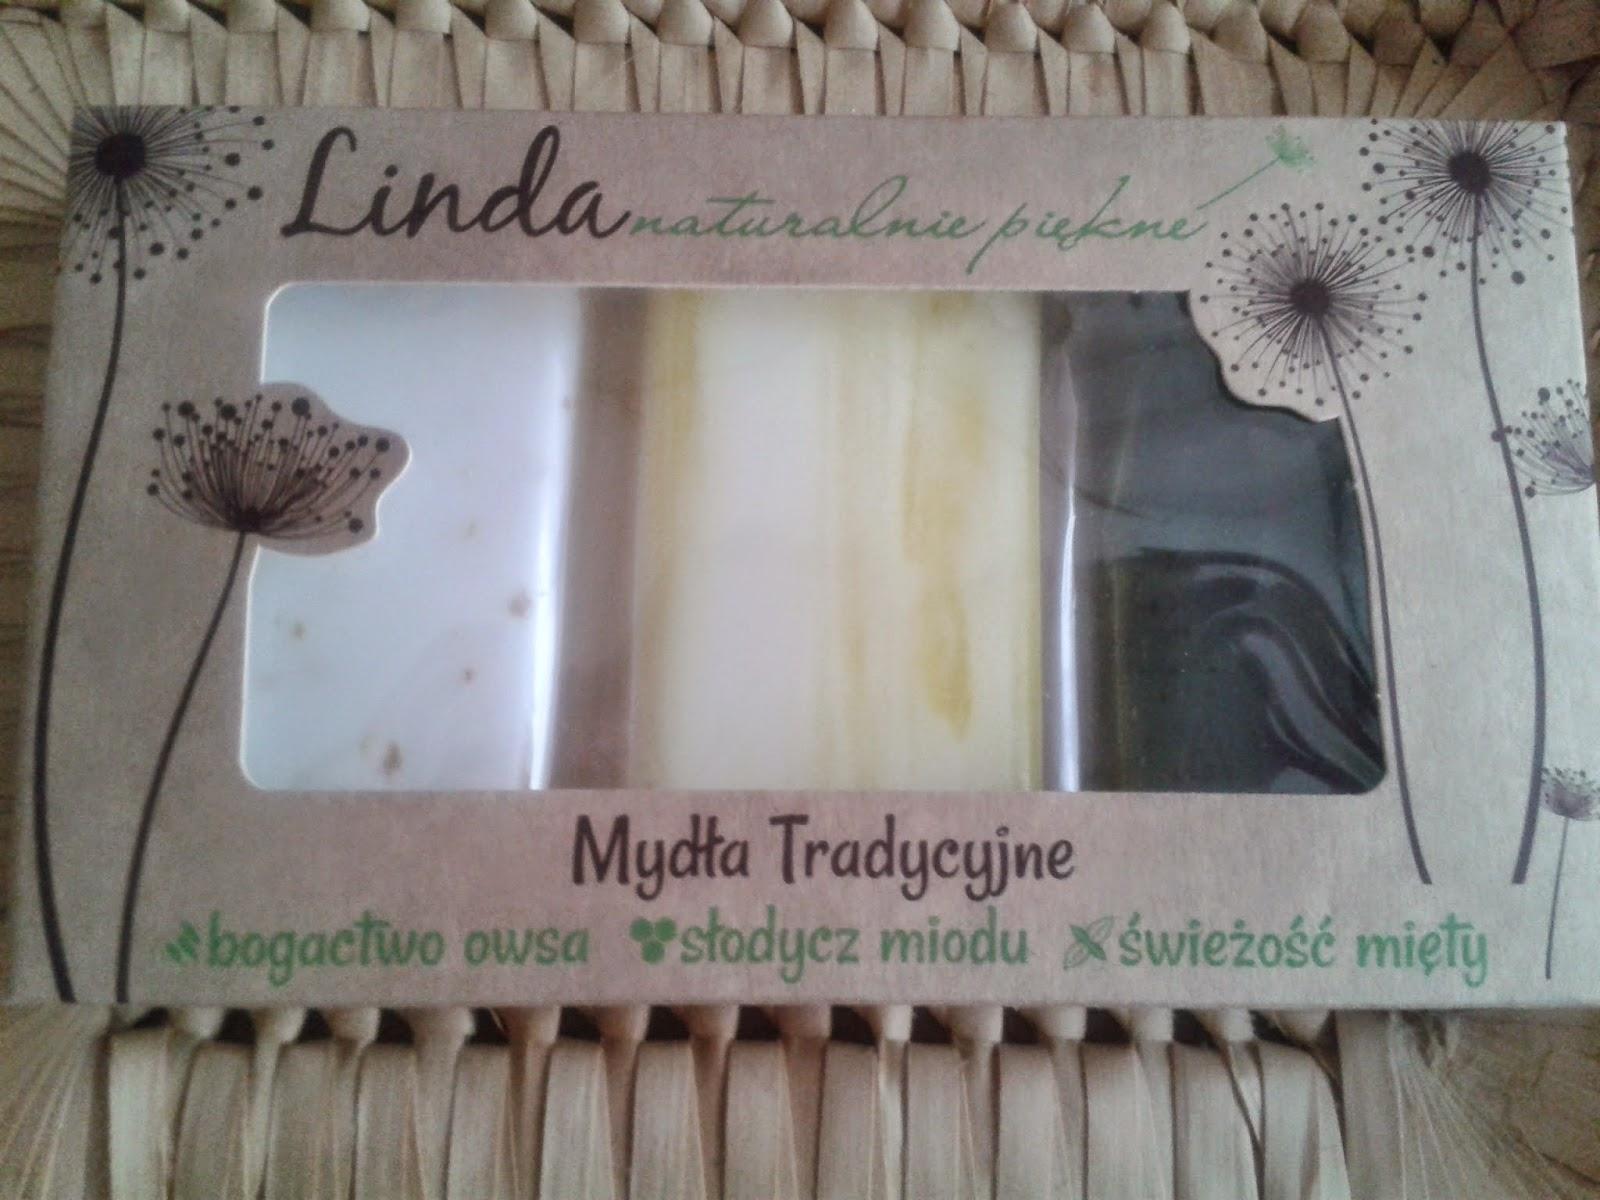 Mydła Linda